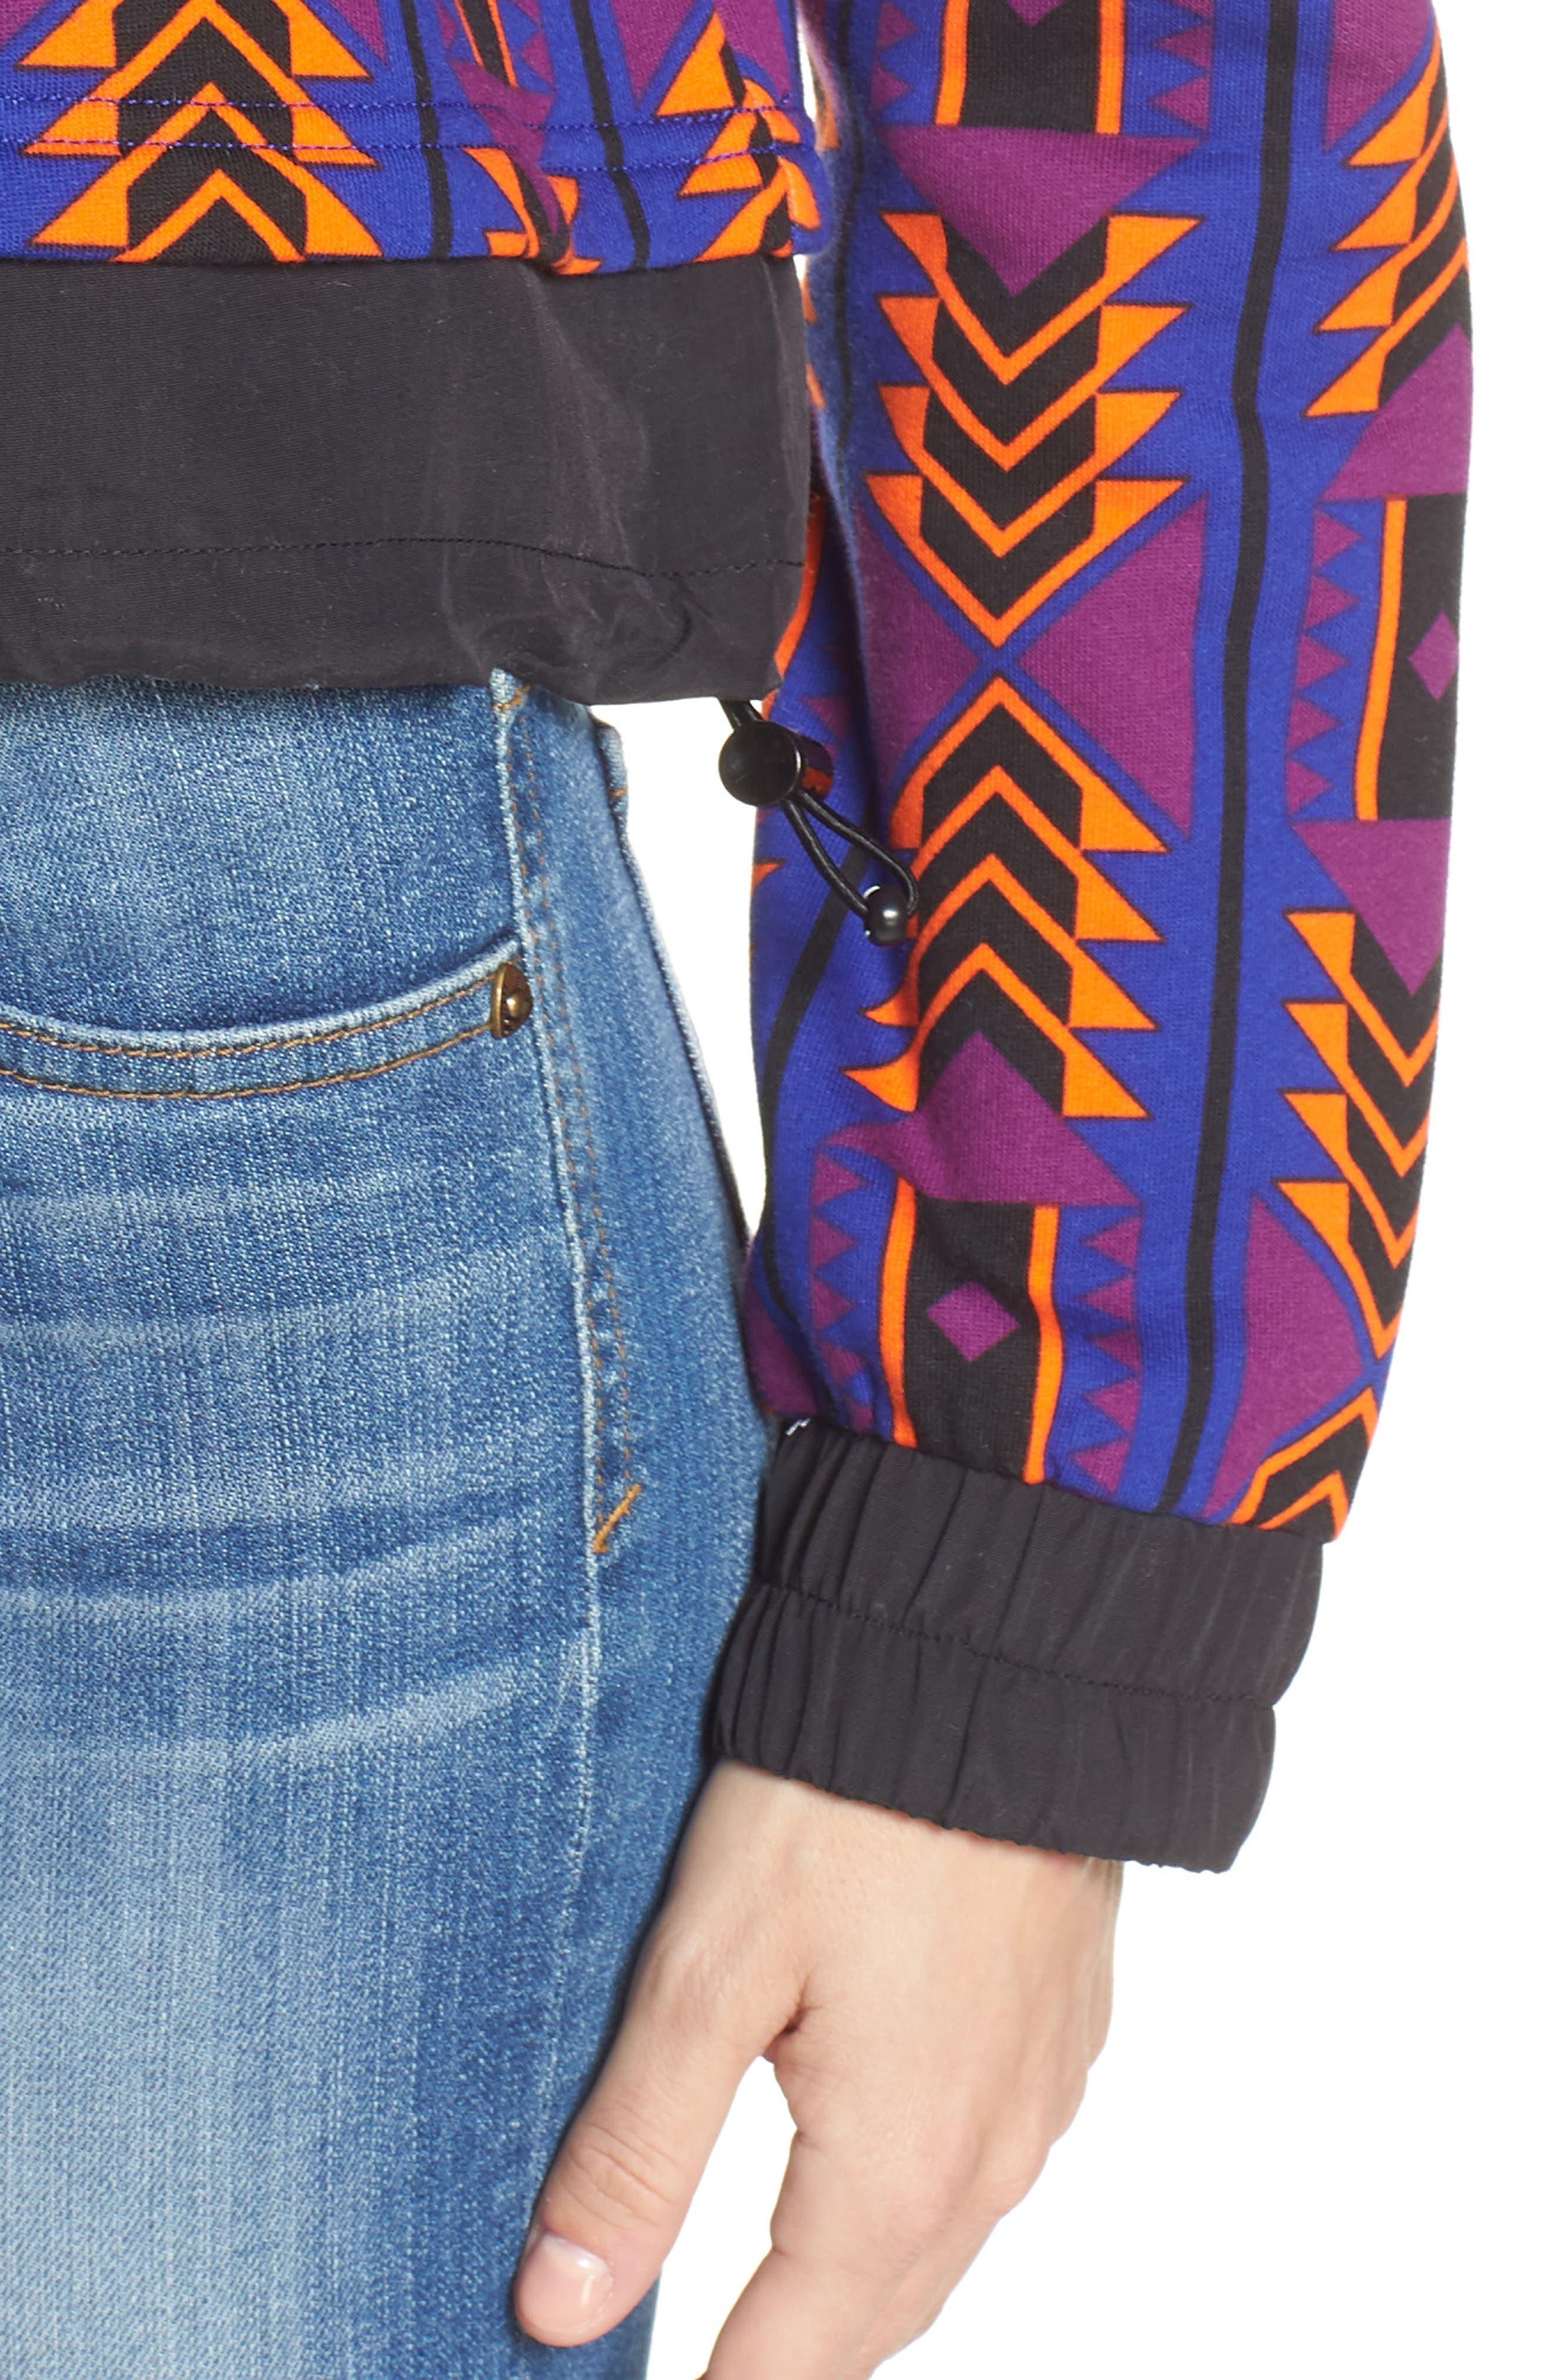 92 Rage Crop Fleece Sweatshirt,                             Alternate thumbnail 4, color,                             AZTEC BLUE 1992 RAGE PRINT